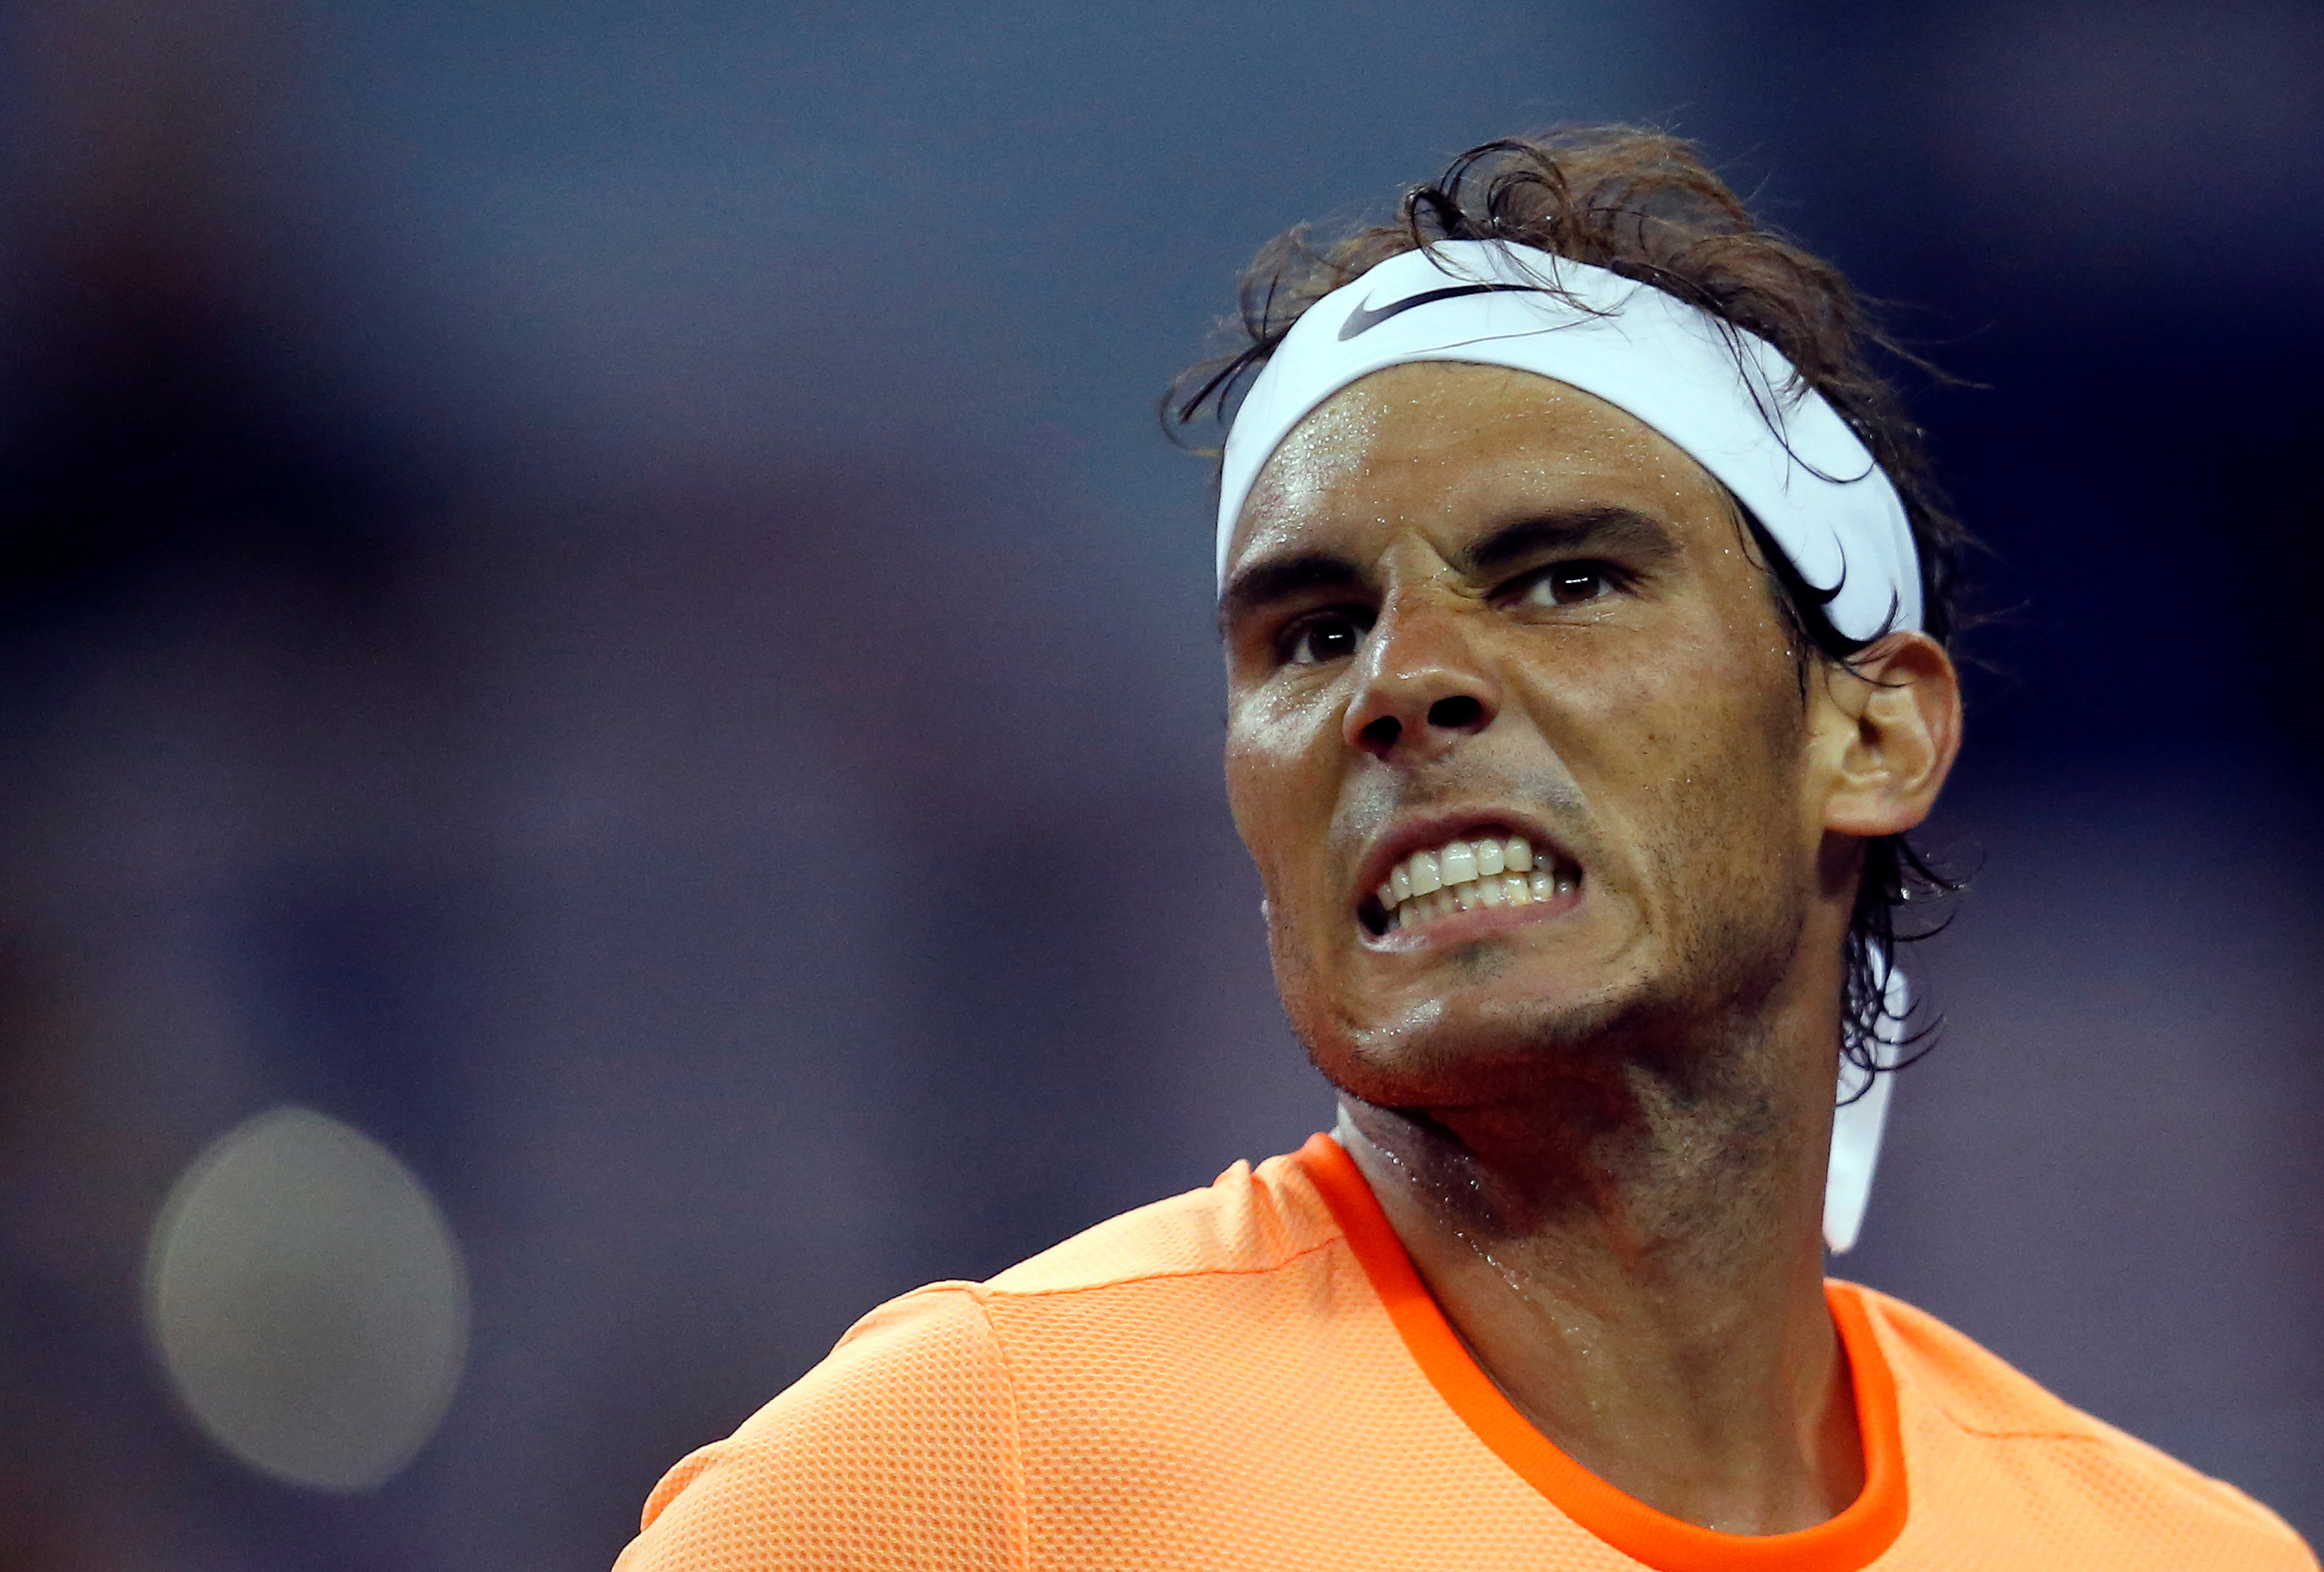 Tennis - ATP - En souffrance, Nadal met fin à sa saison 2016